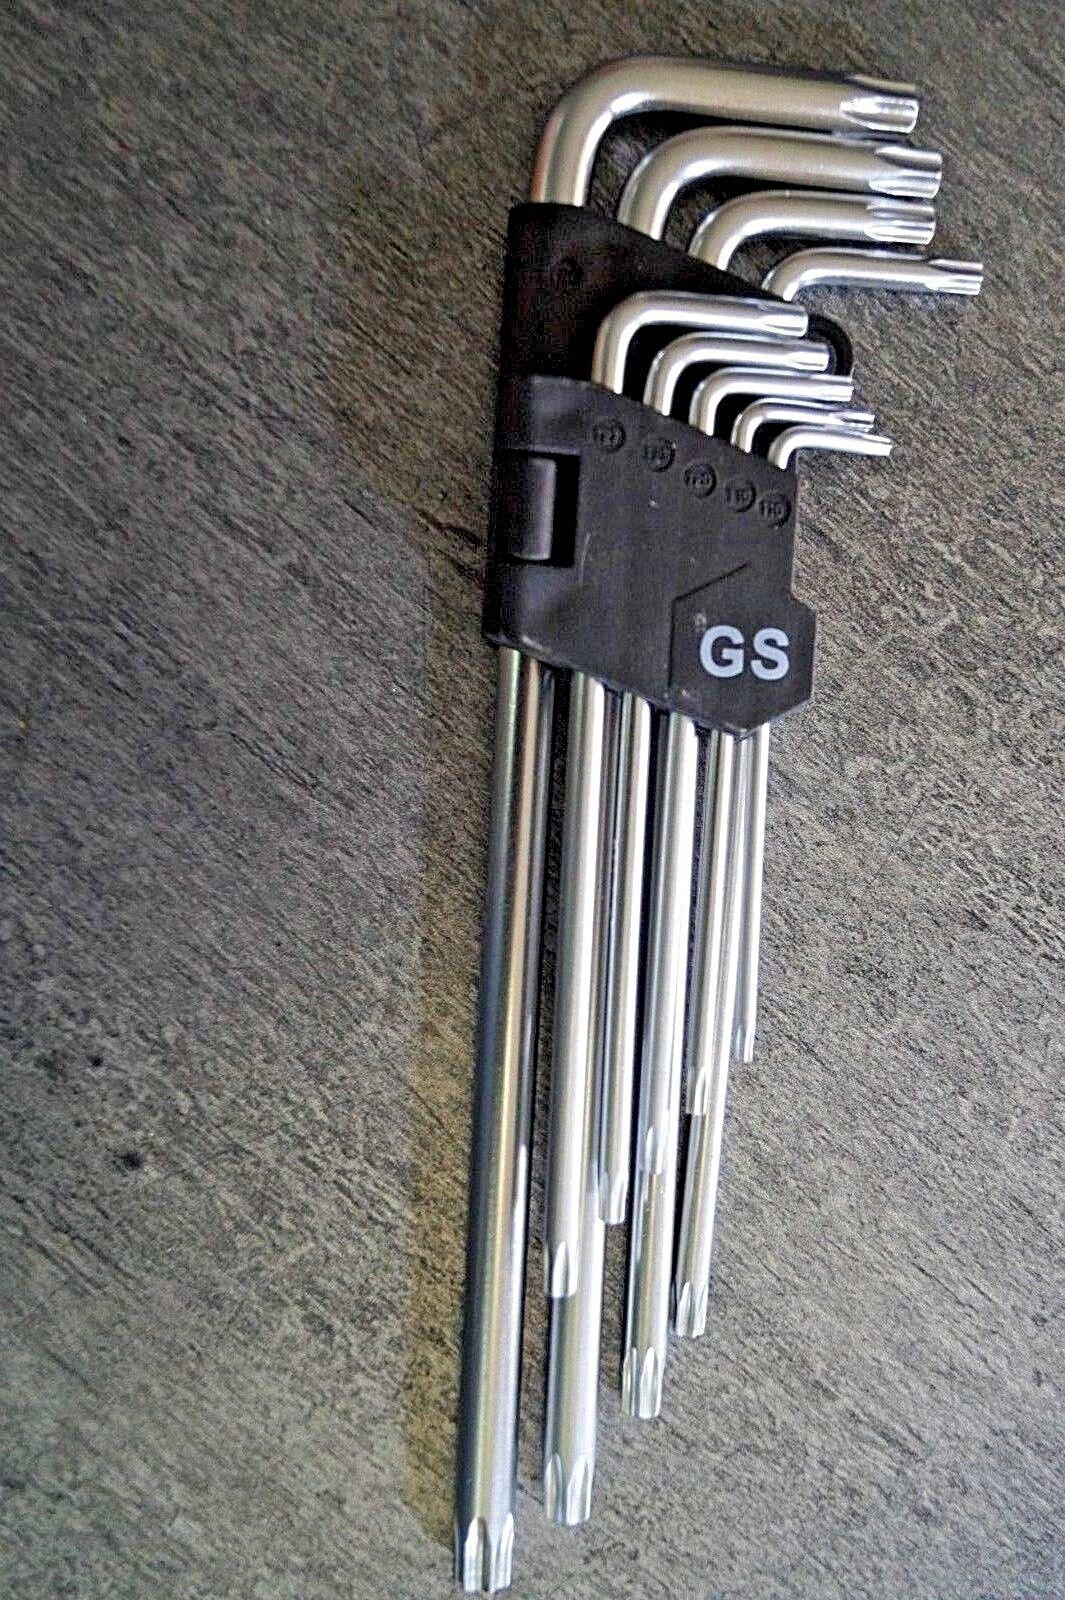 9 x Torx Winkelschlüssel CrV T10 - T50 lang Steckschlüssel Satz Schraubendreher